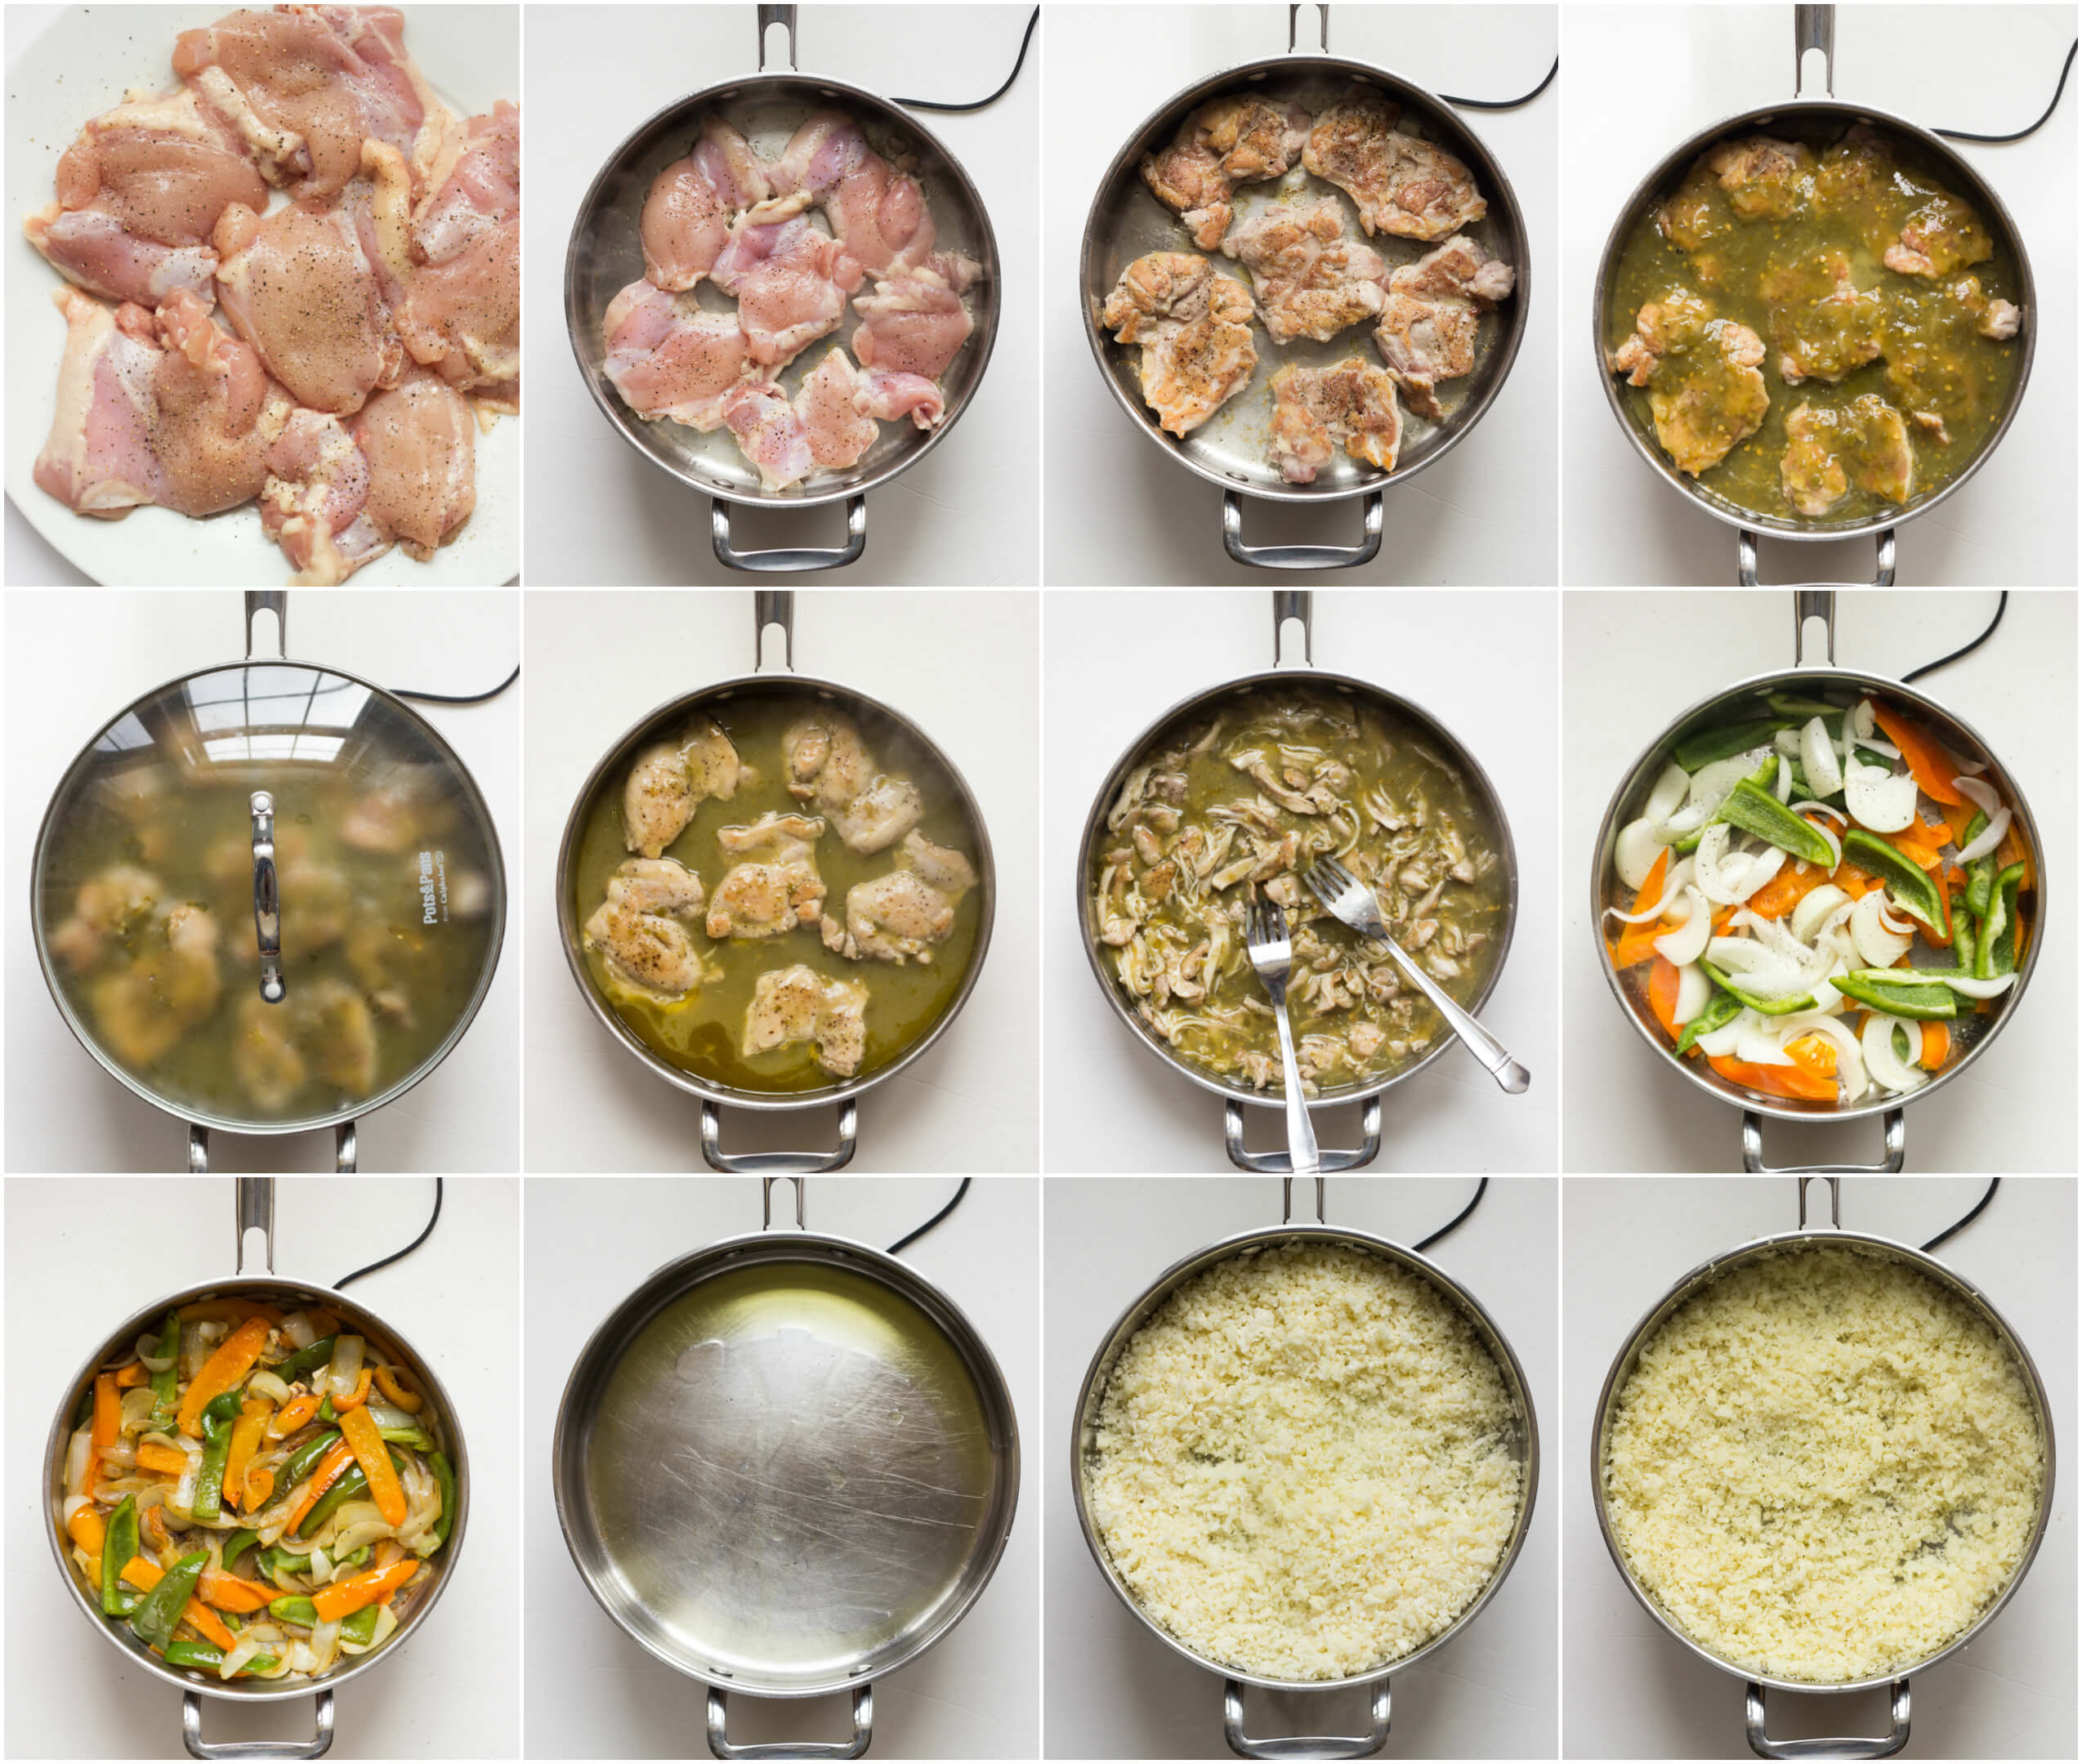 Easy Chicken Mexican Bowls (2 Ways!) - easy skillet shredded chicken served over cauliflower rice or white rice. Choice is yours. | littlebroken.com @littlebroken